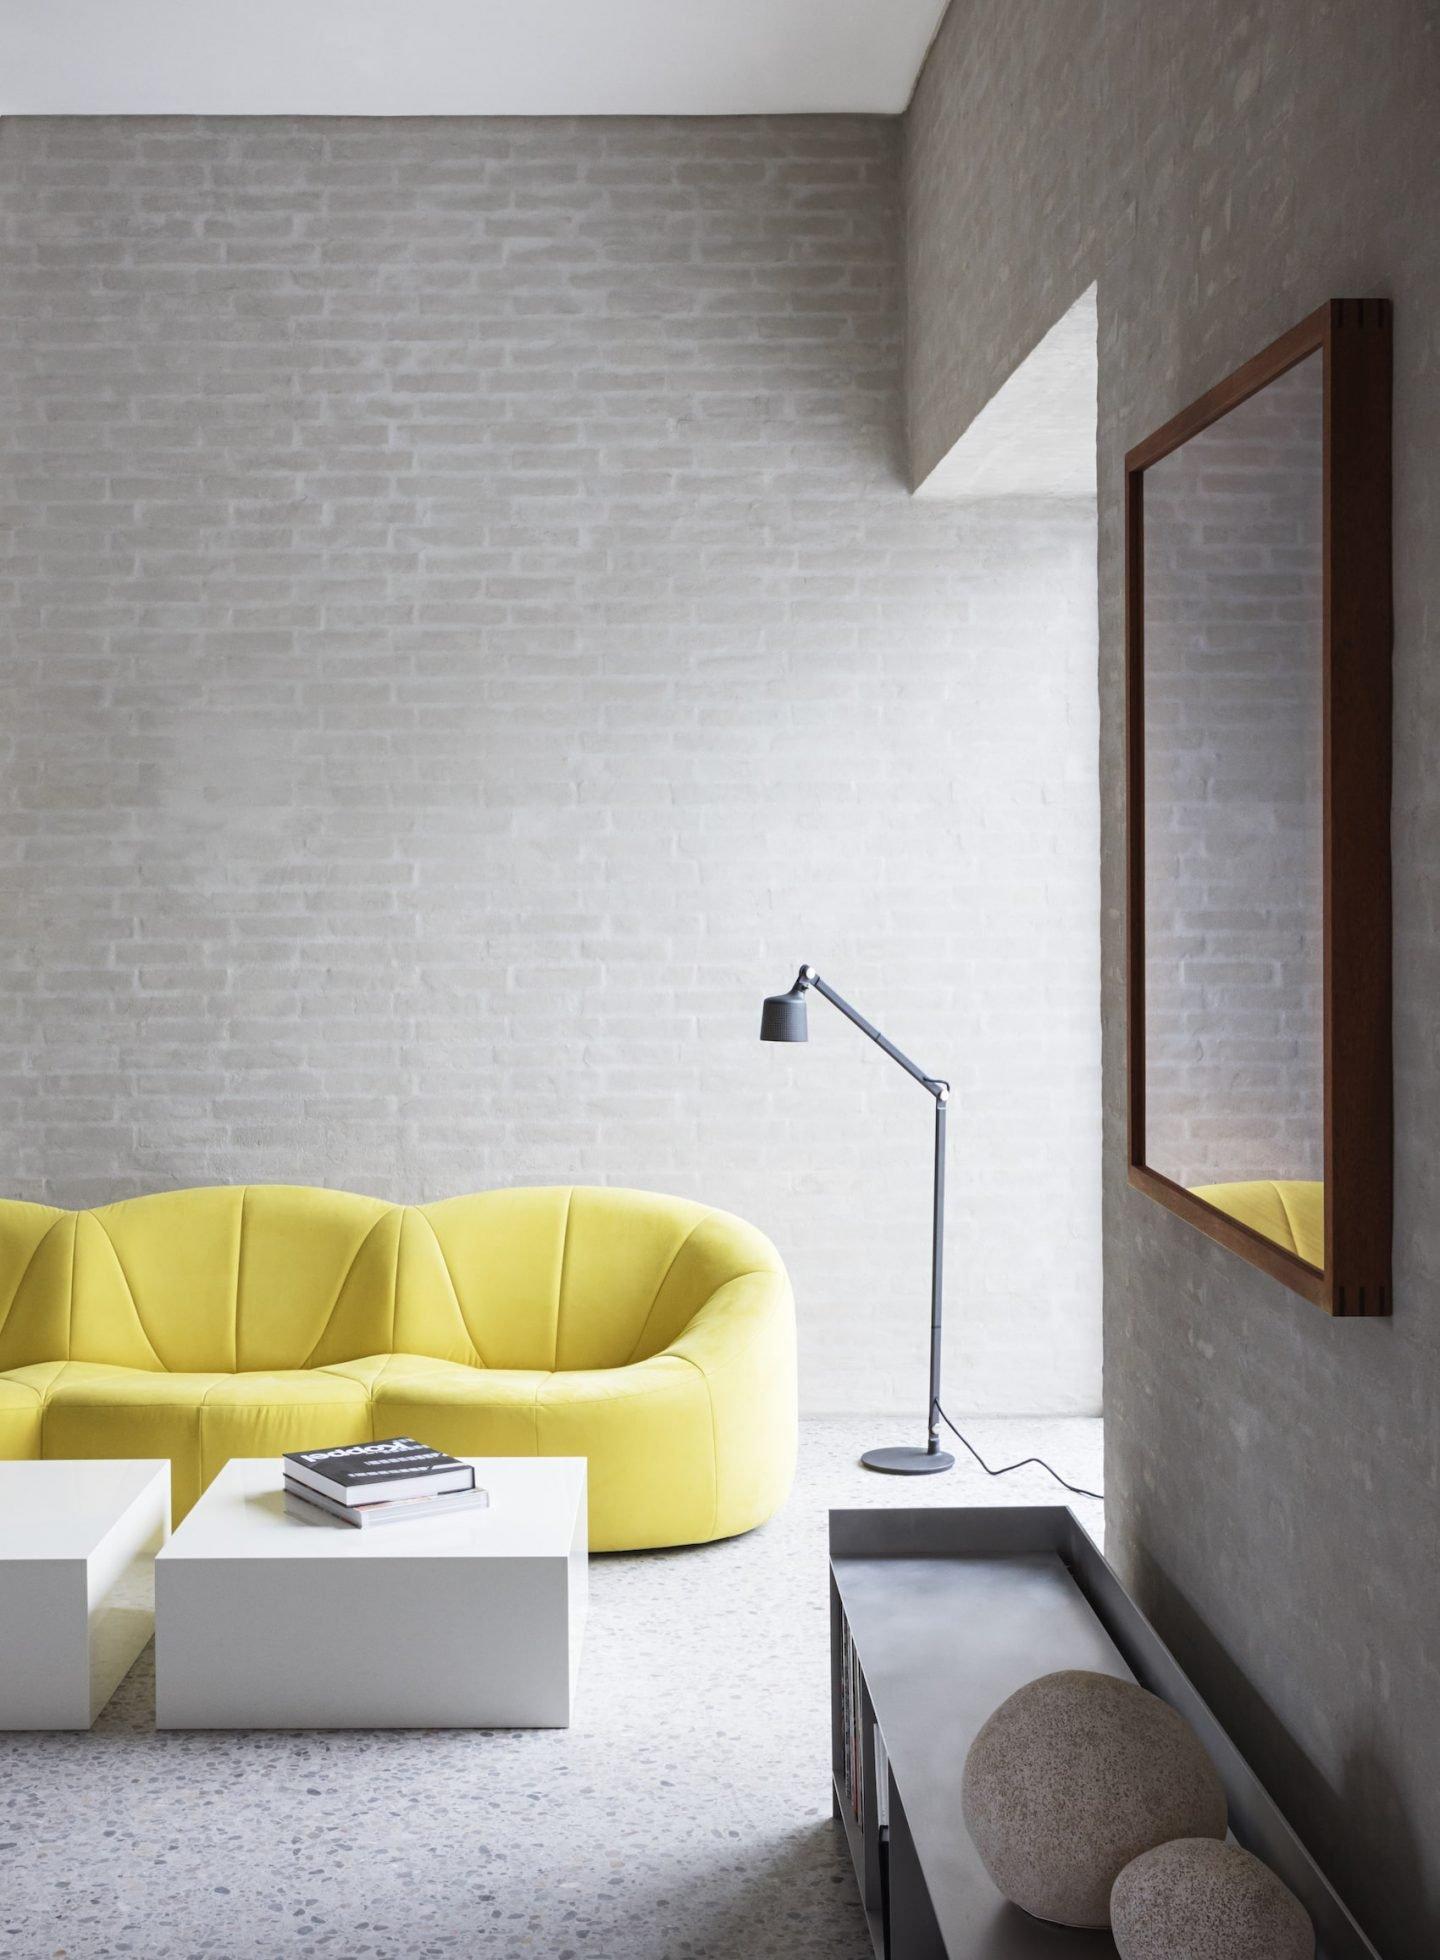 IGNANT-Design-David-Thulstrup-Studio-Visit-002